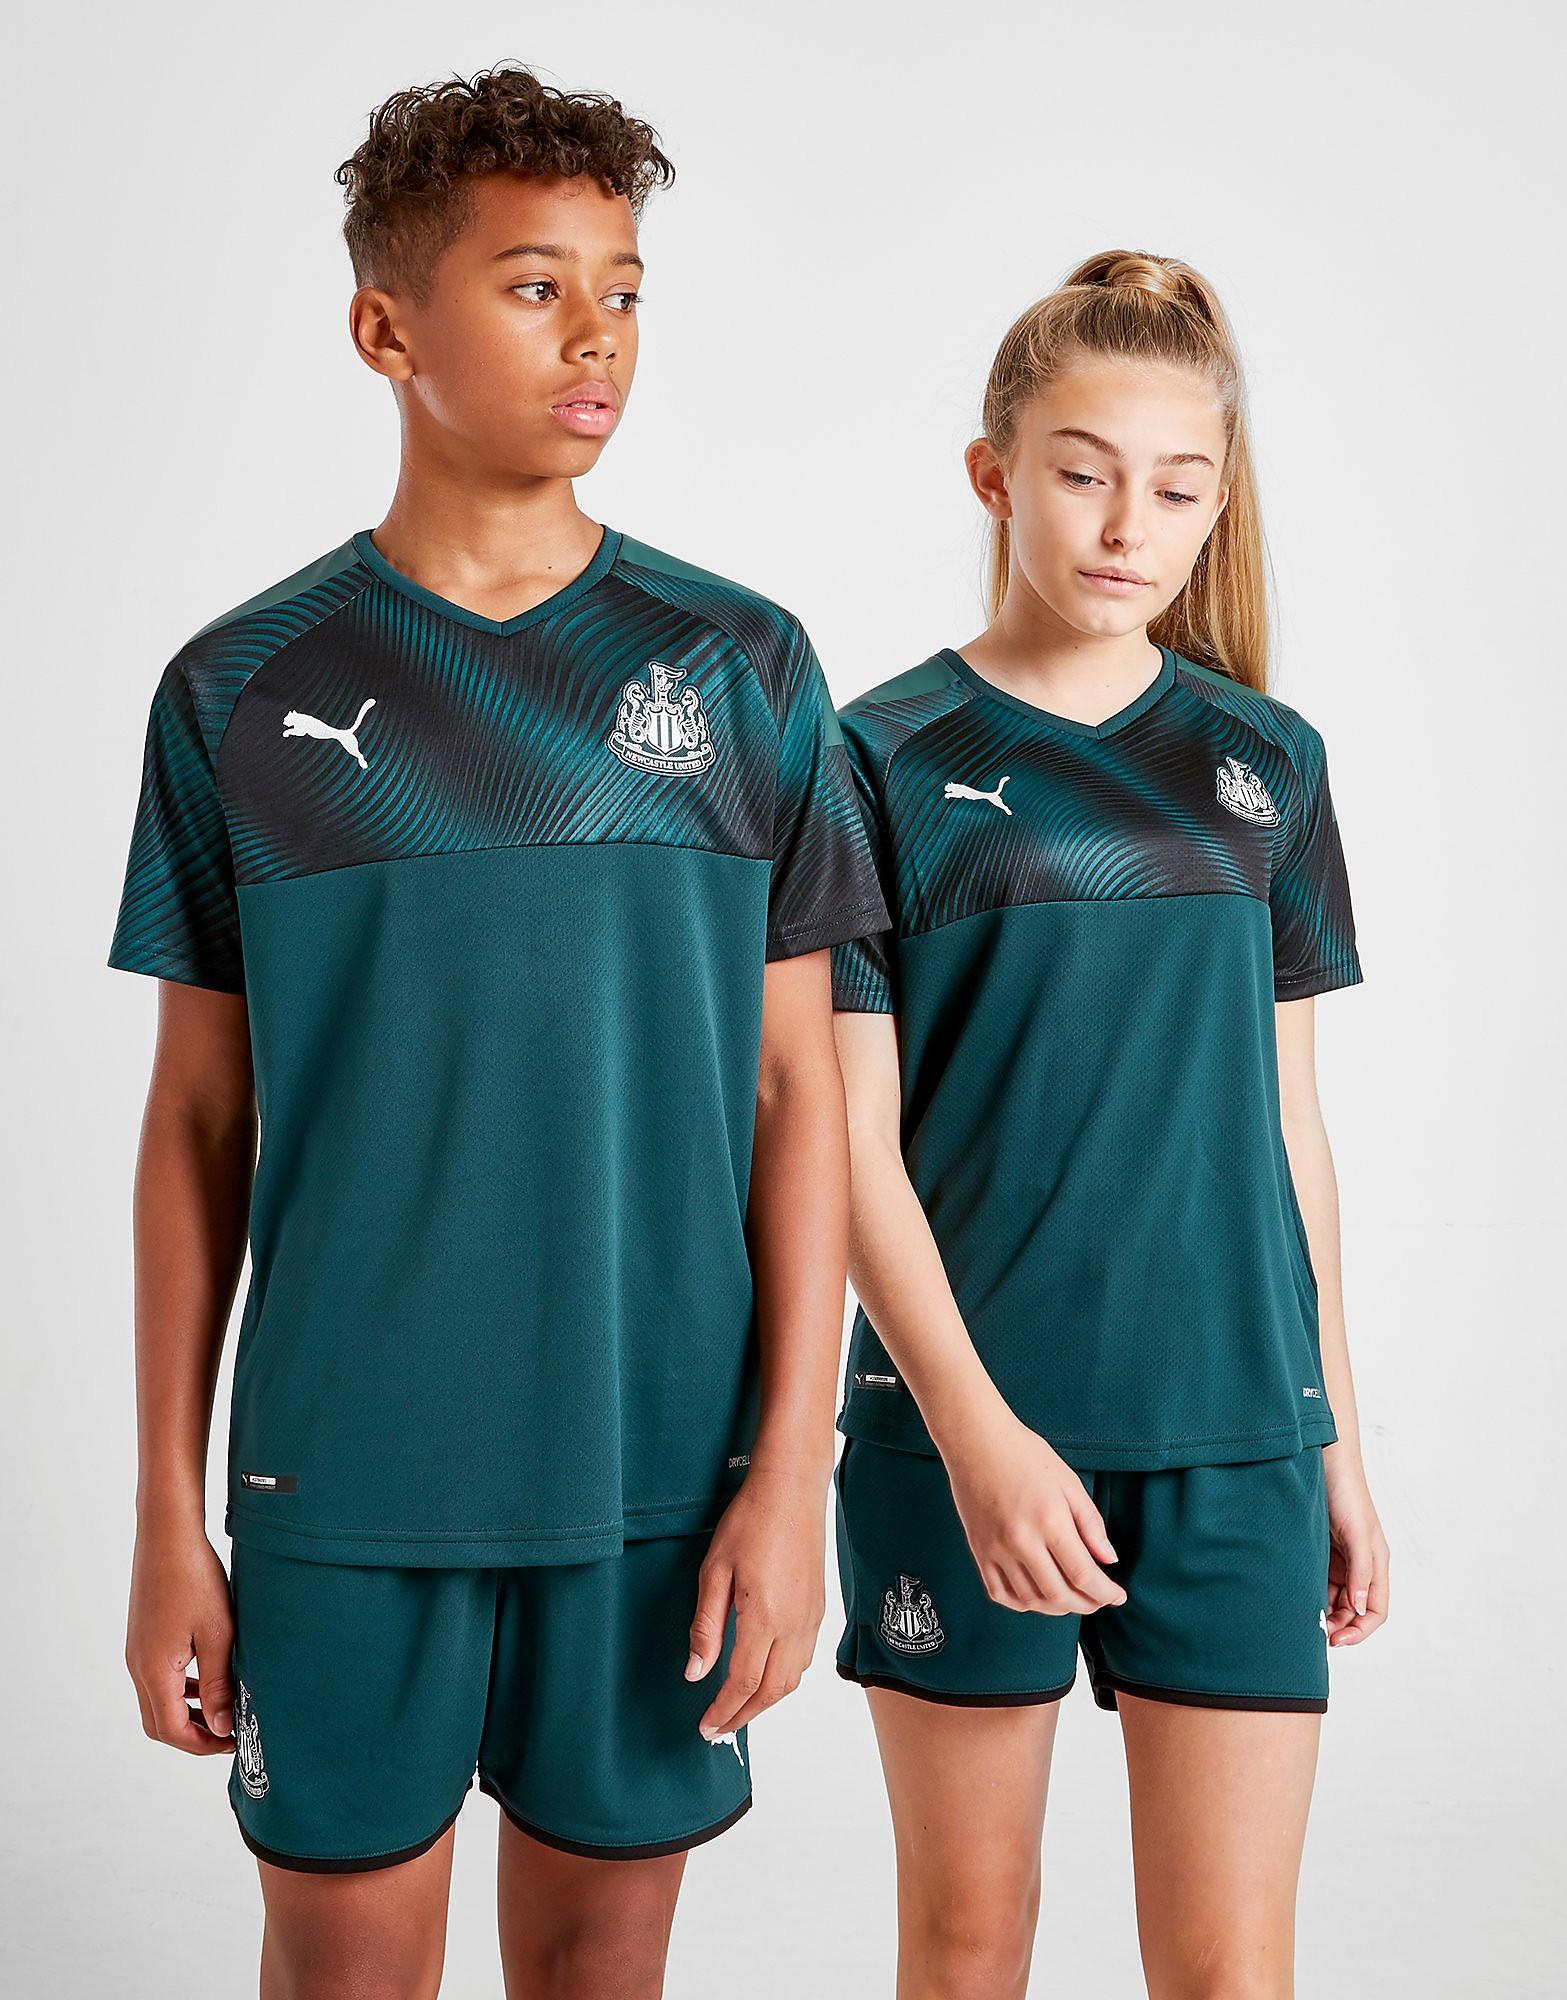 PUMA Newcastle United FC 2019/20 Away Shirt Junior Groen Kind